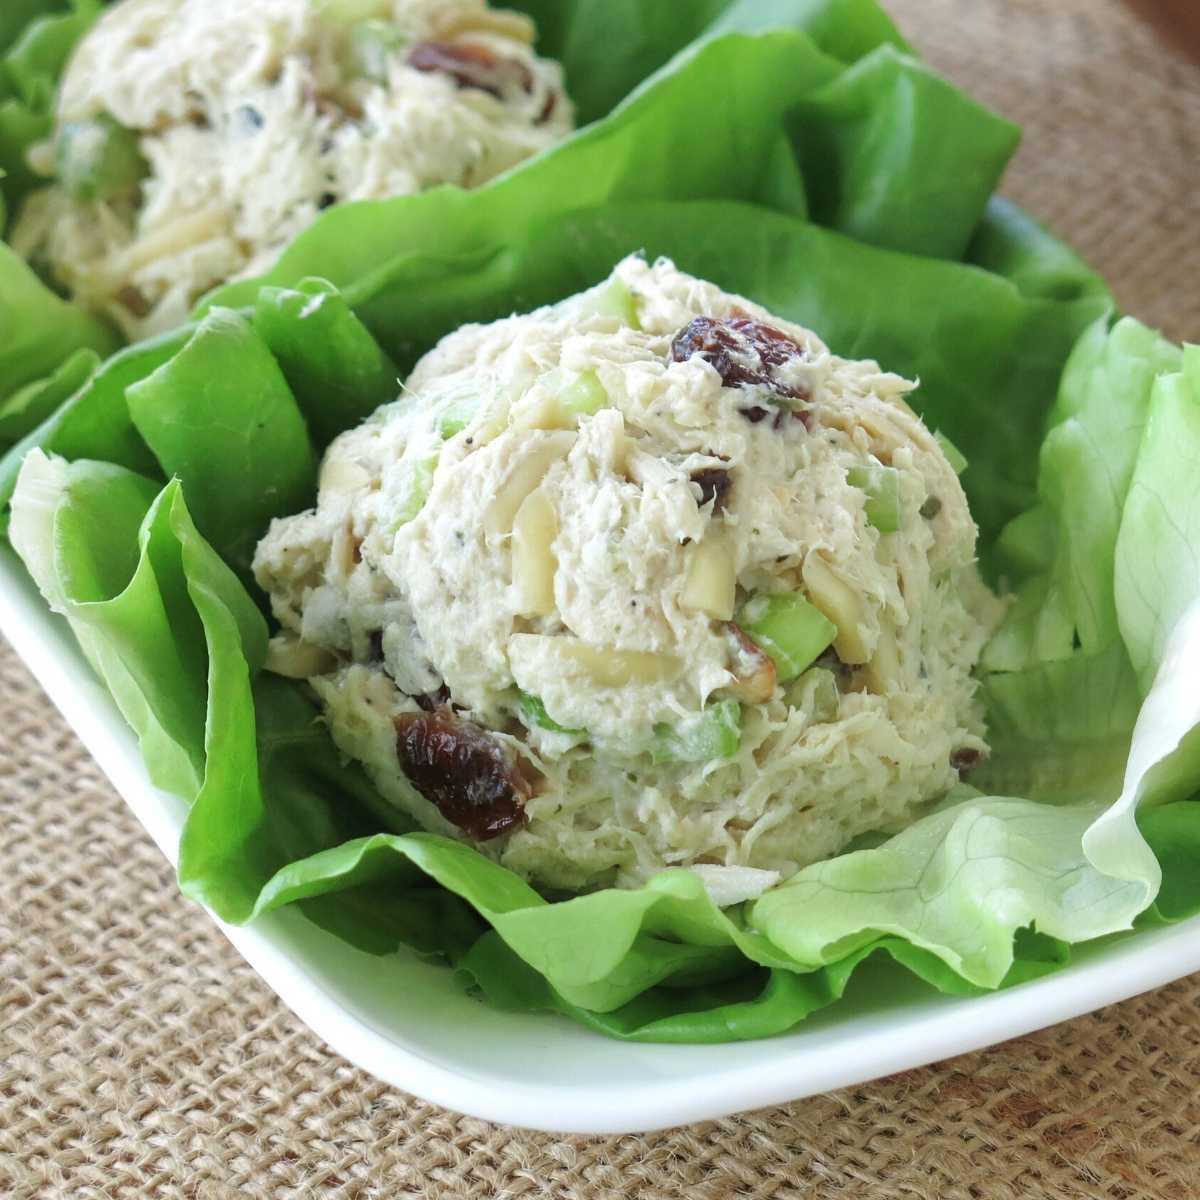 Slow cooker chicken salad with Greek Yogurt, almonds and celery on a lettuce leaf.